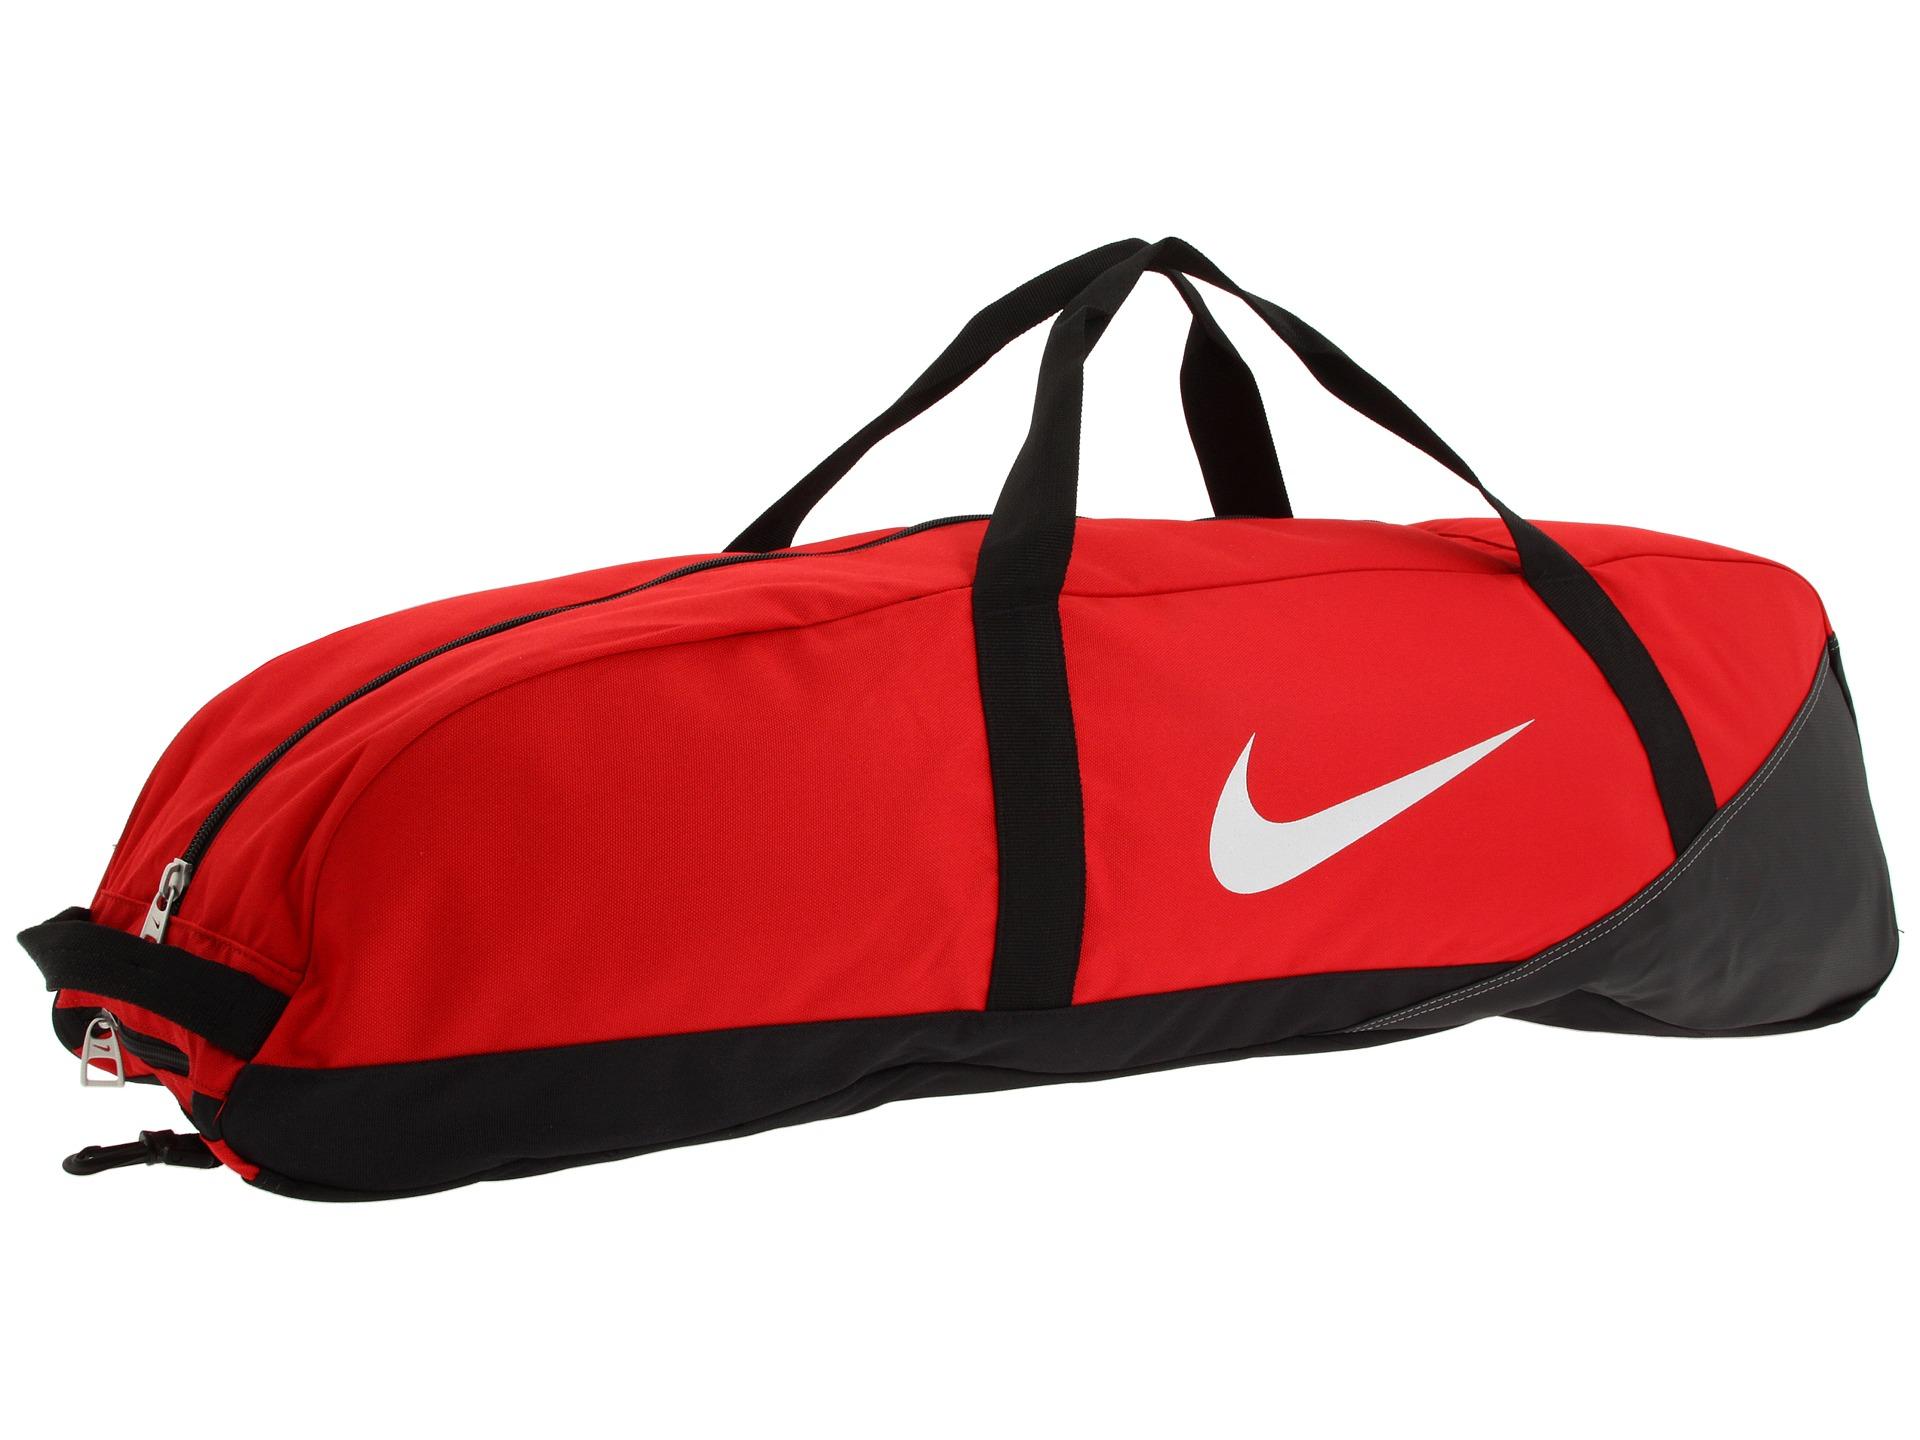 Nike Keystone Baseball Duffel Bag Large Shipped Free At Zappos